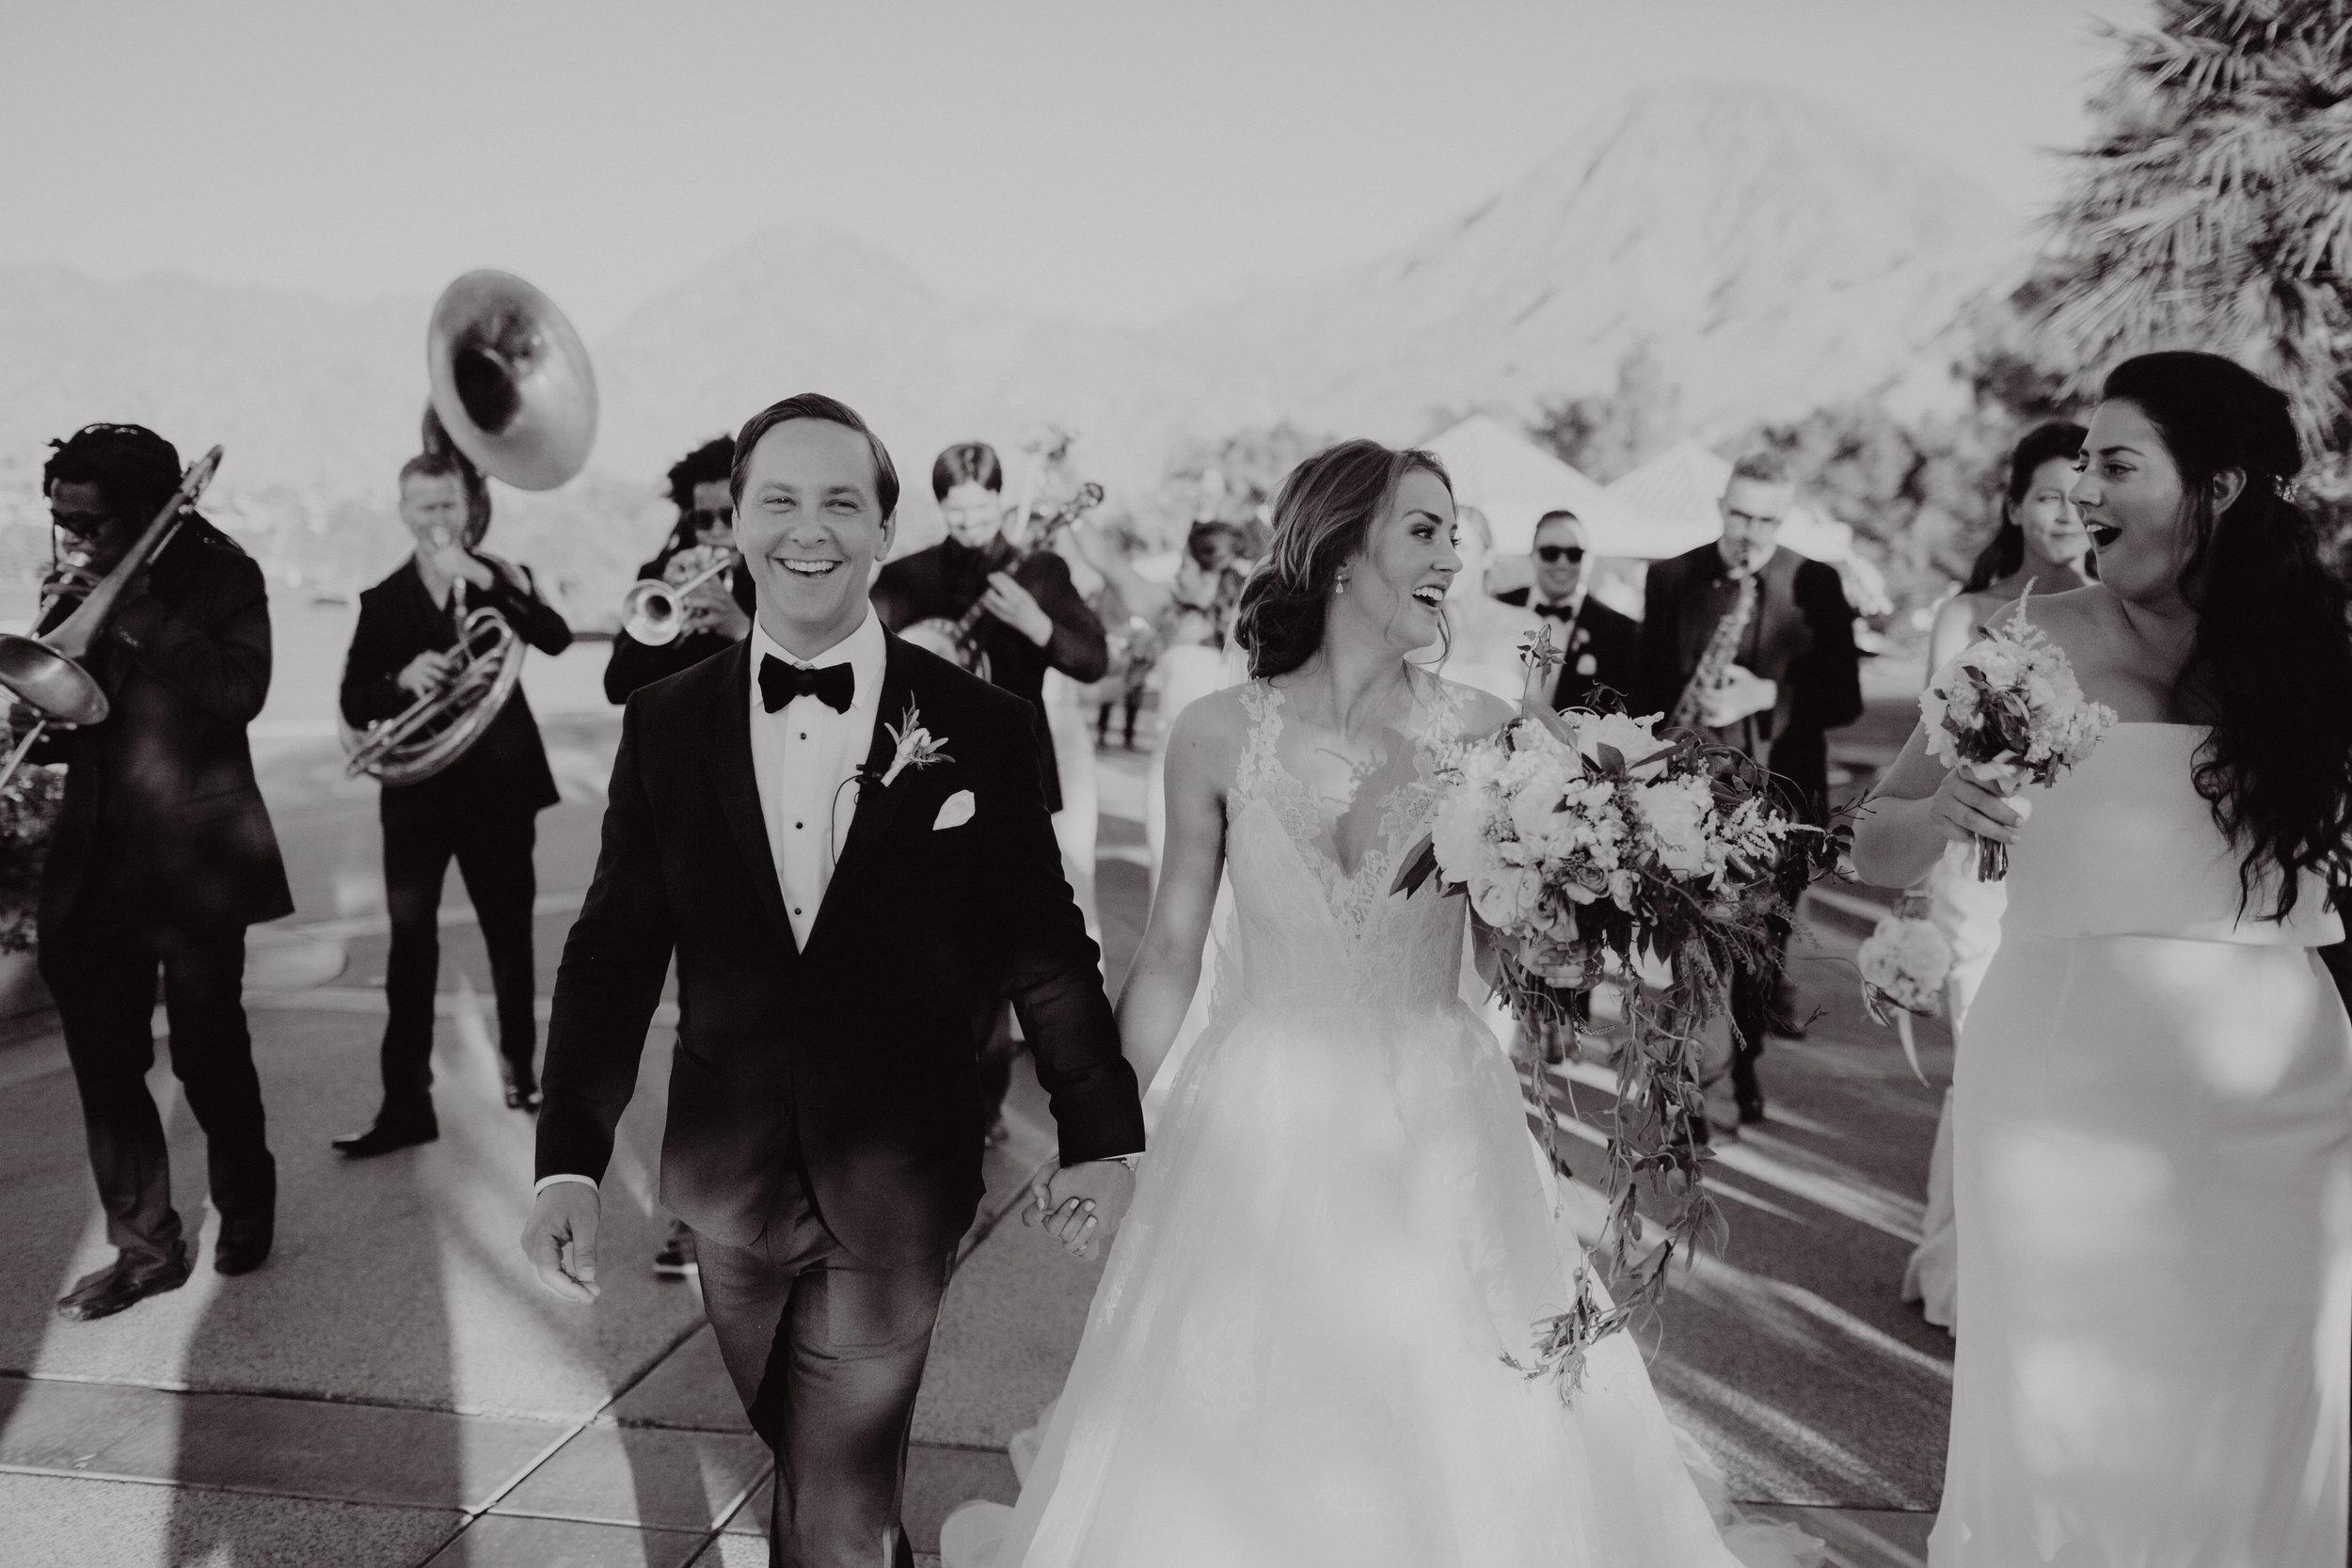 Liz + Josh Wedding in Palm Springs! The Mudbug Brass Band